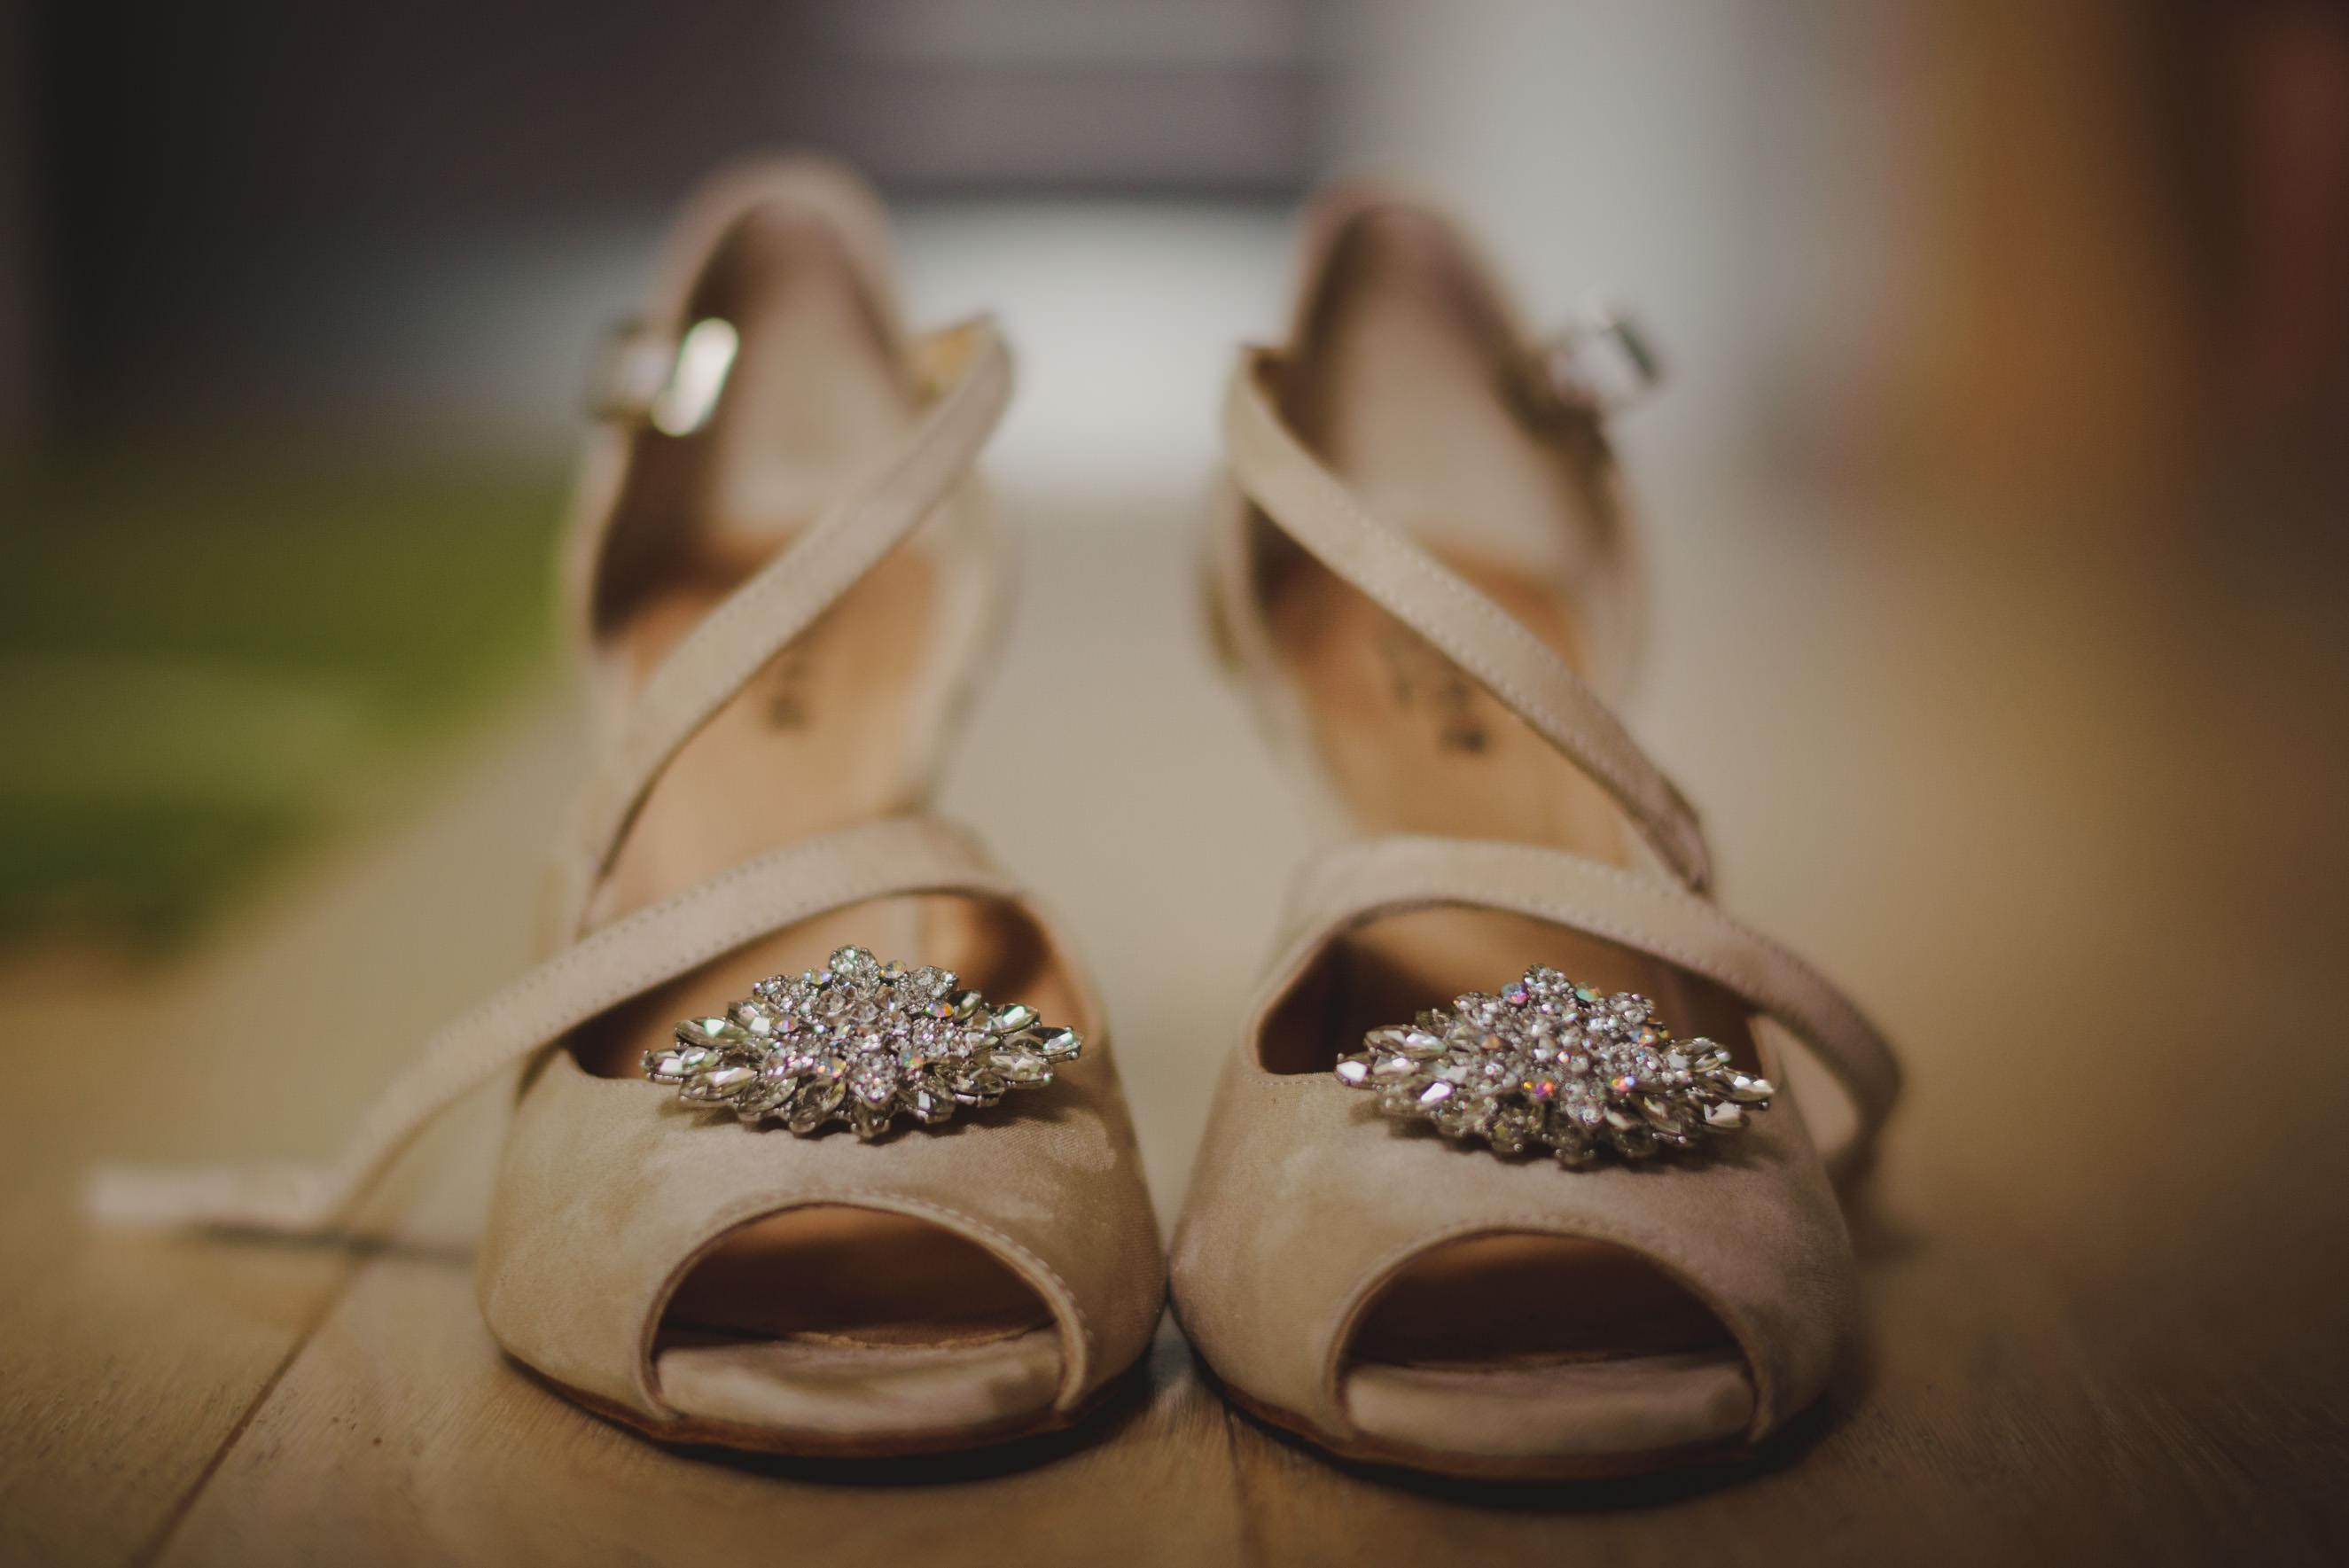 setup shot of wedding shoes by Jimmy Choo